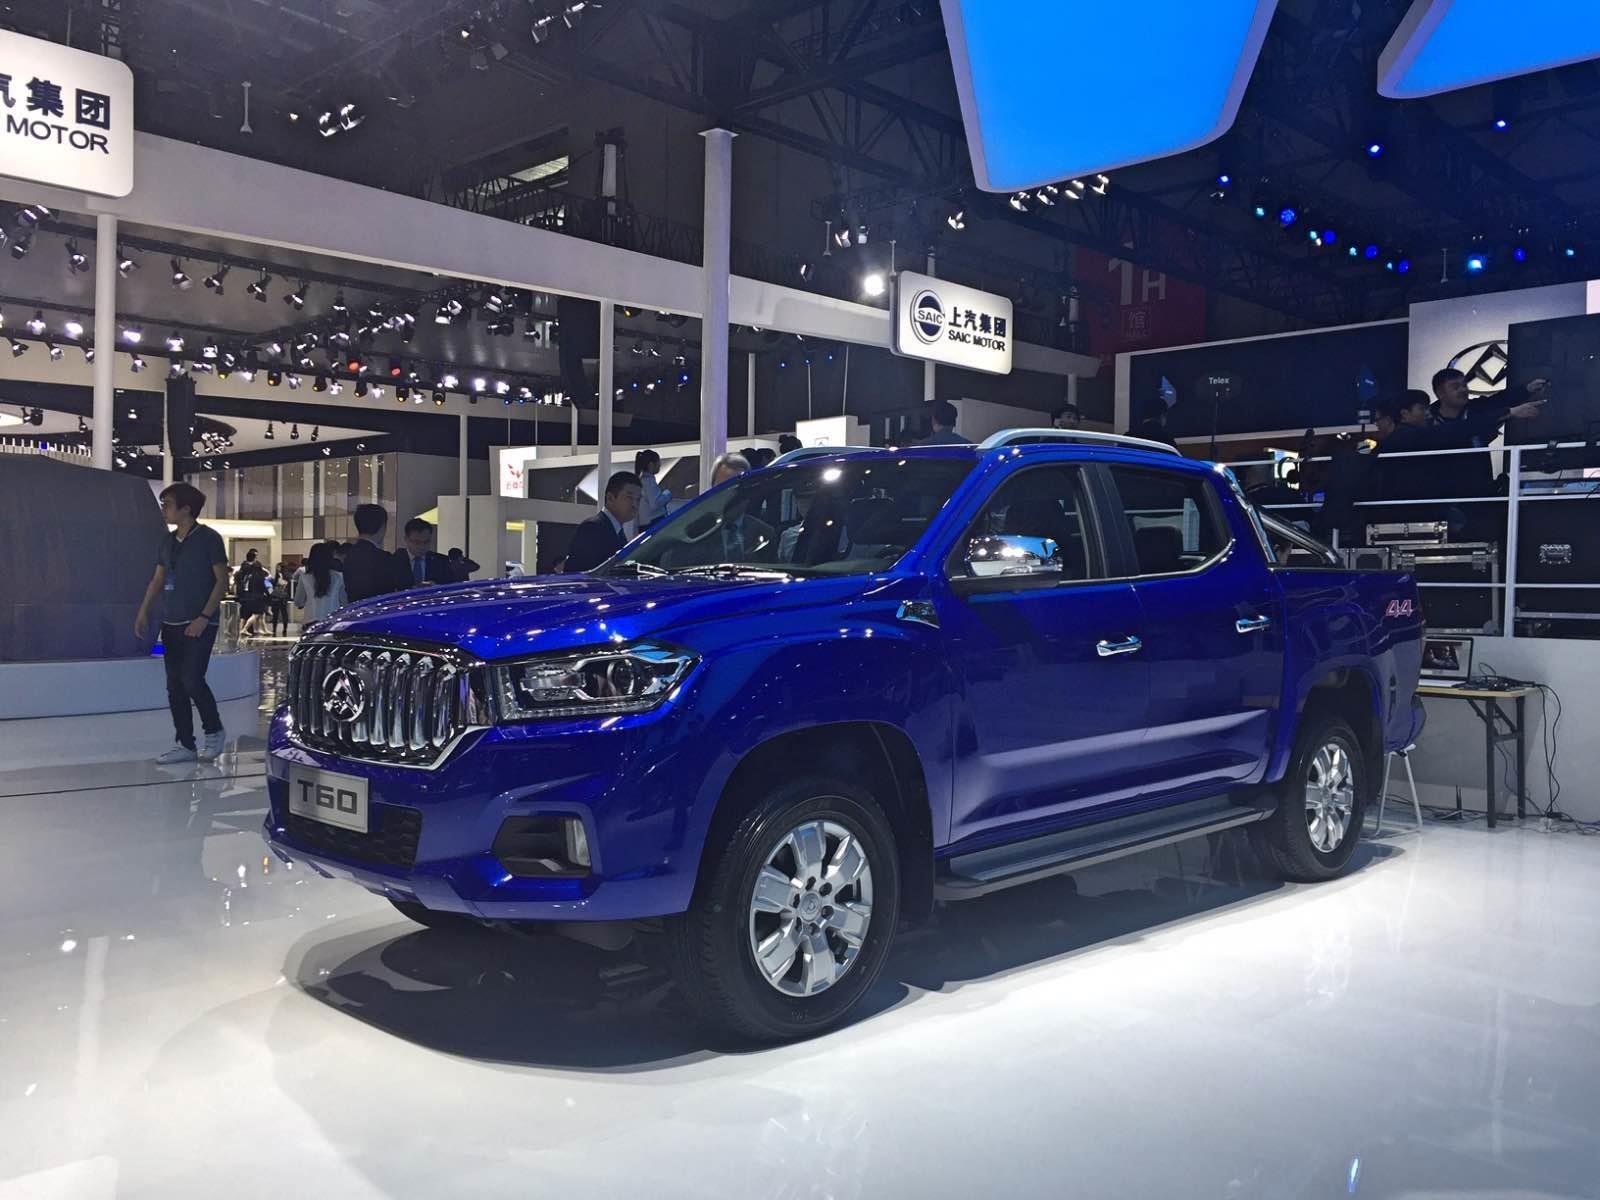 Maxus T60 2018, otra atractiva pick-up desde China